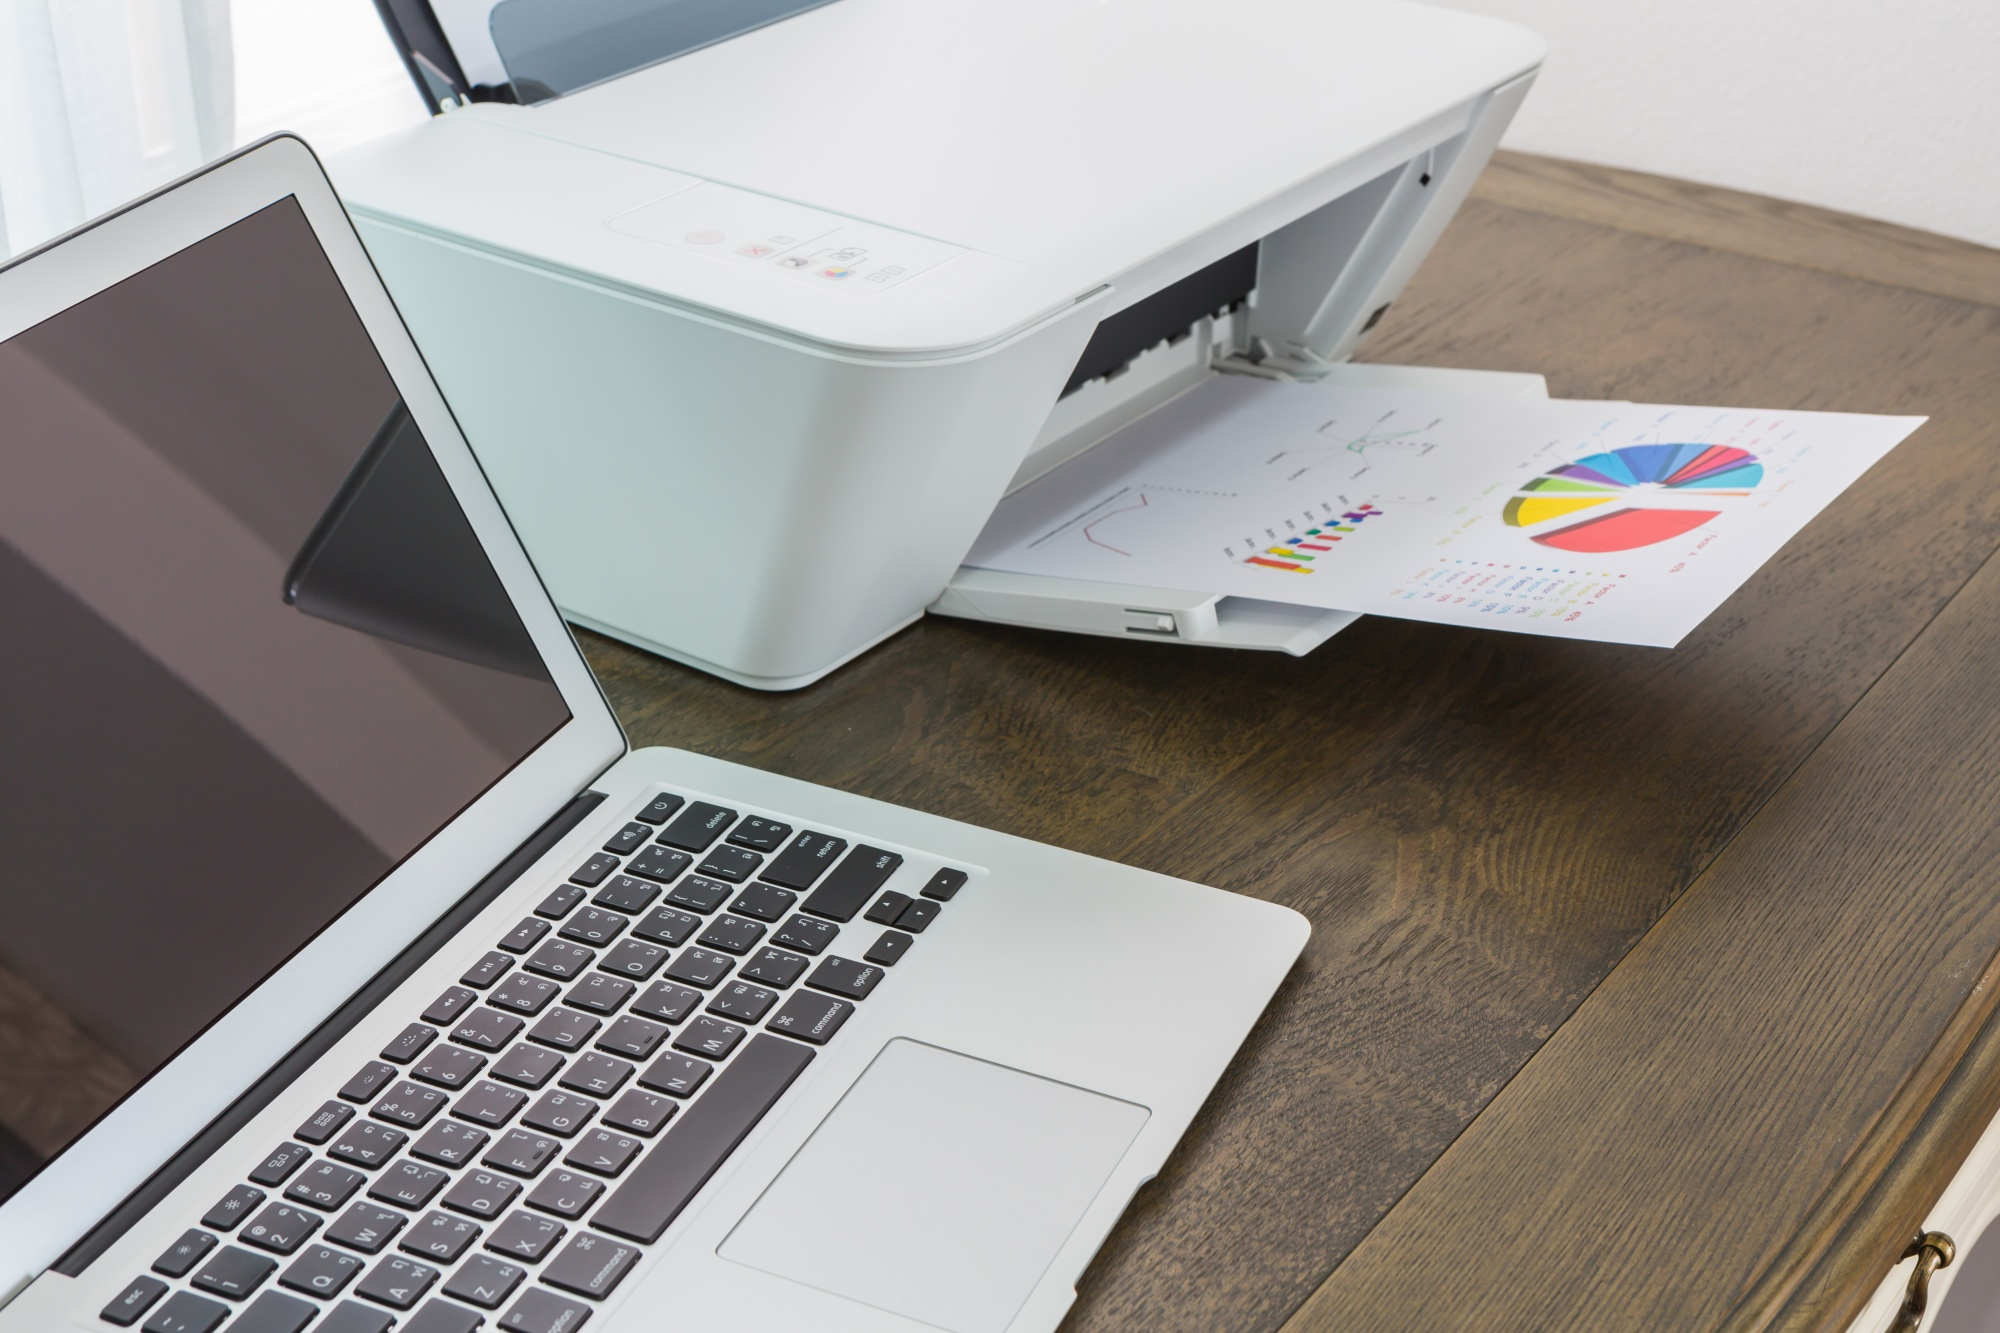 Laptop and printer on desk